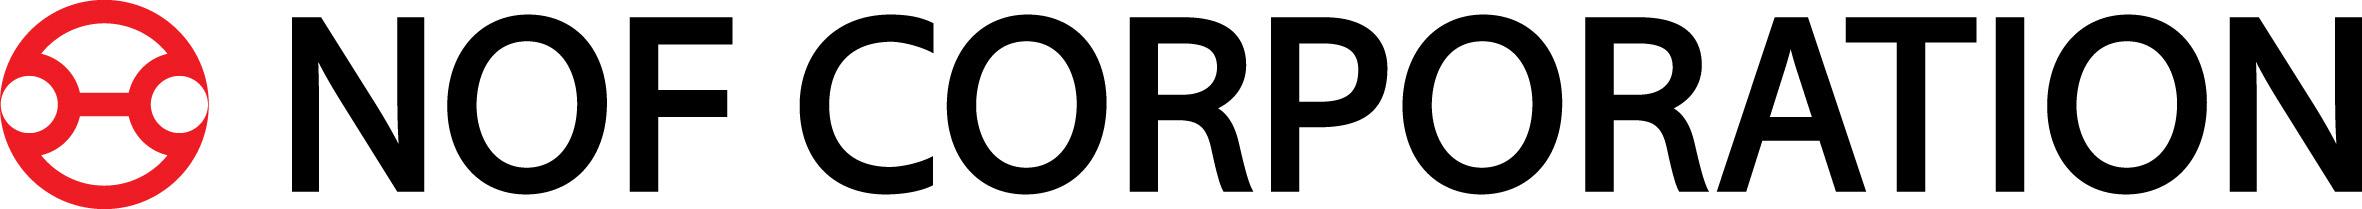 NOF_CORPORATION2